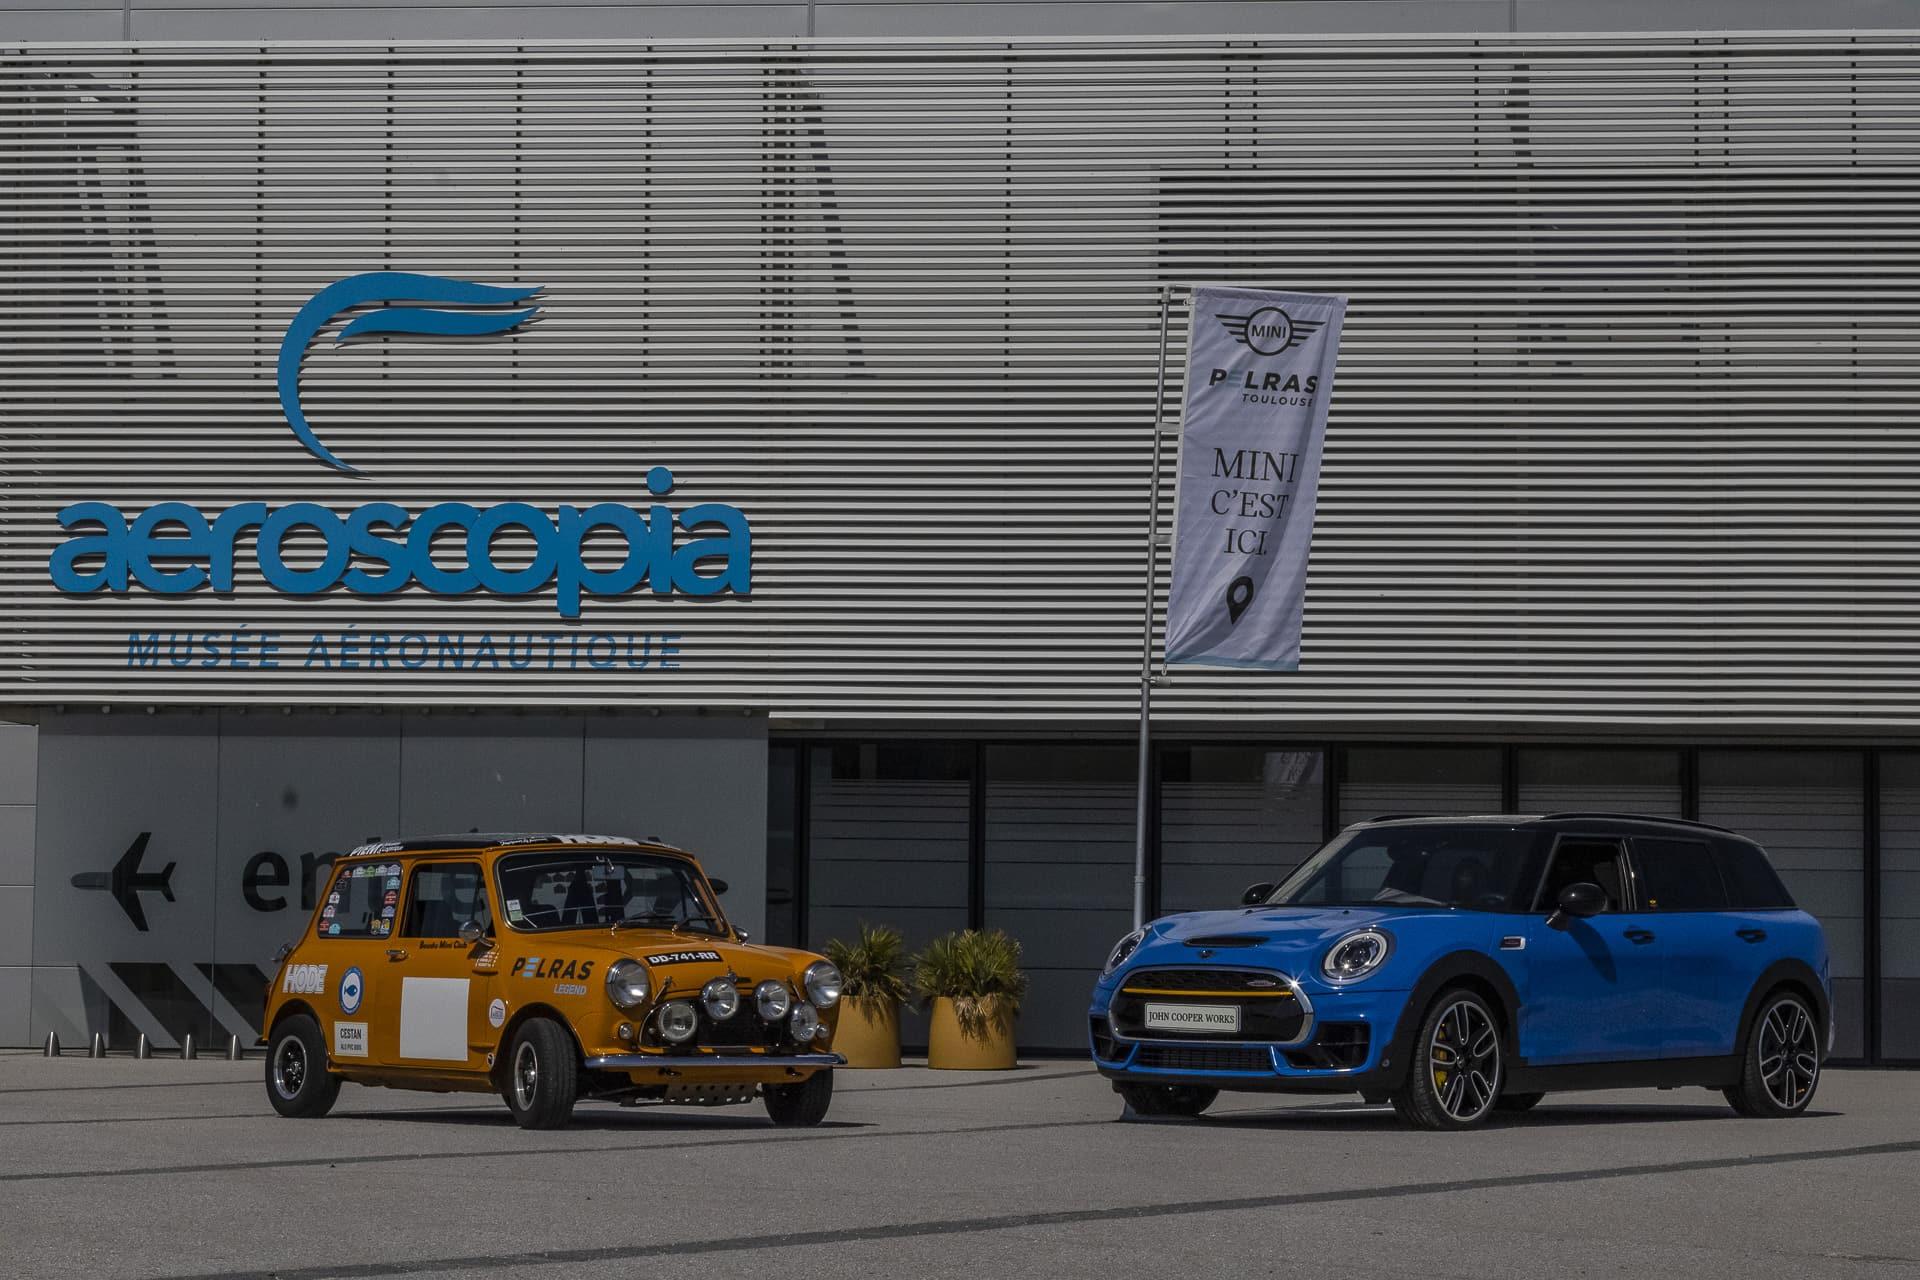 Aeroscopia et Mini